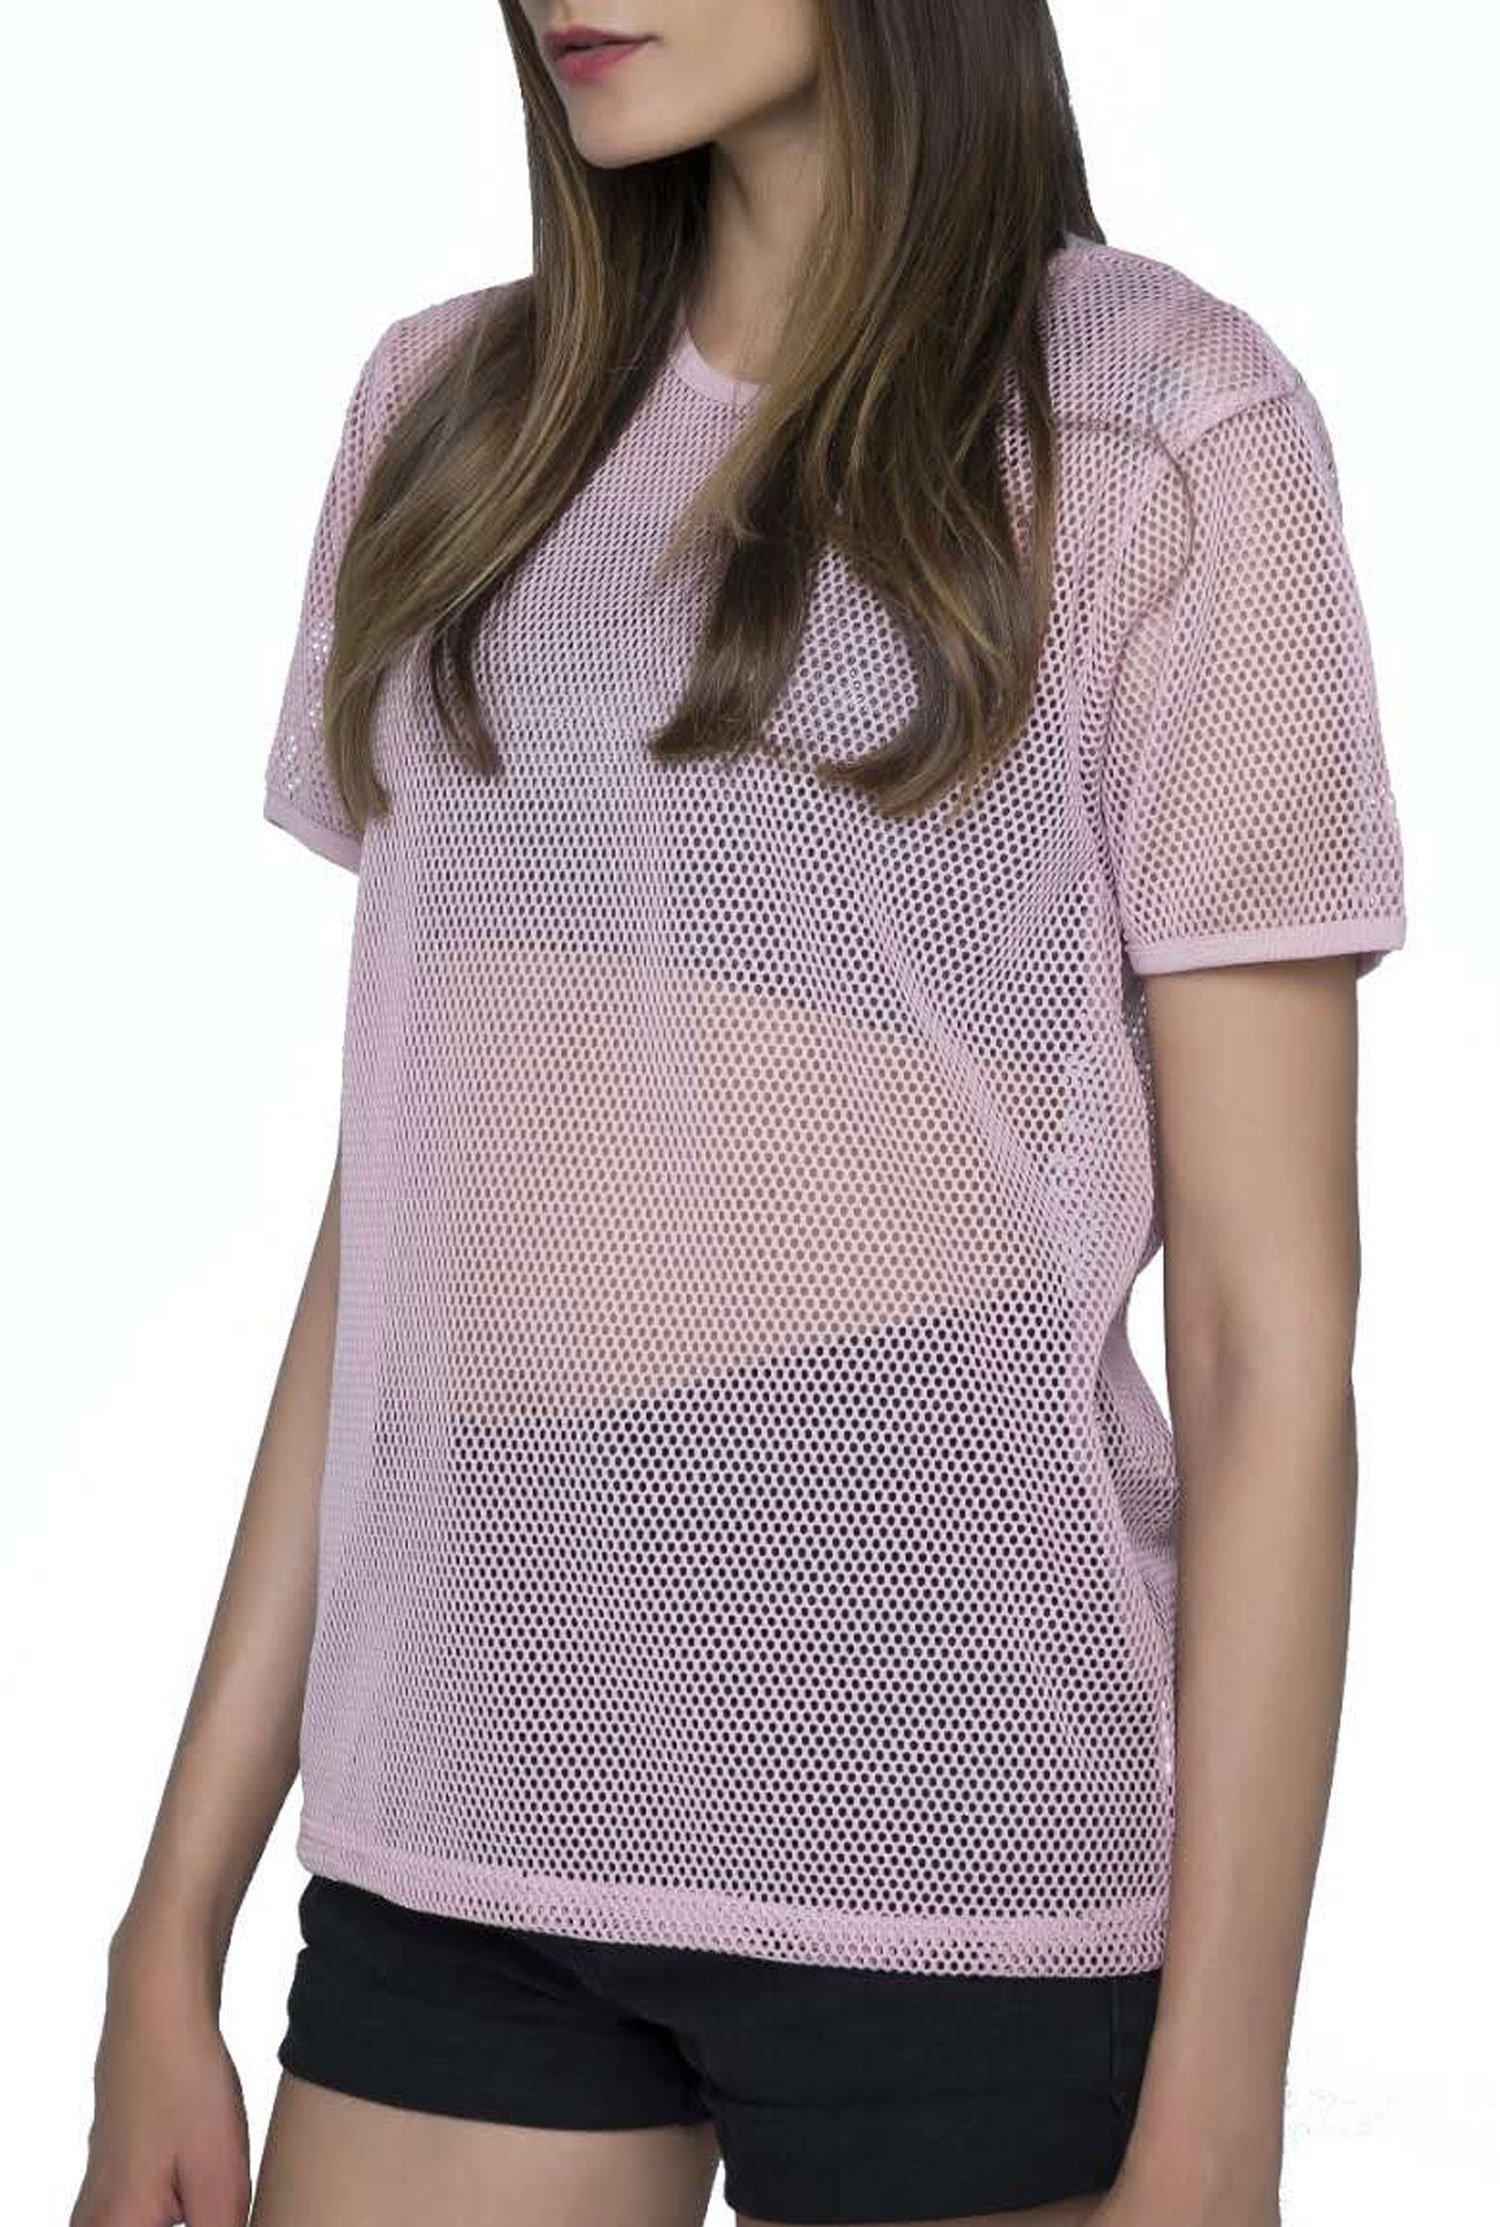 SPECIALMAGIC Fashion Short Sleeve See Through Sheer Mesh T Shirt Top Pink S